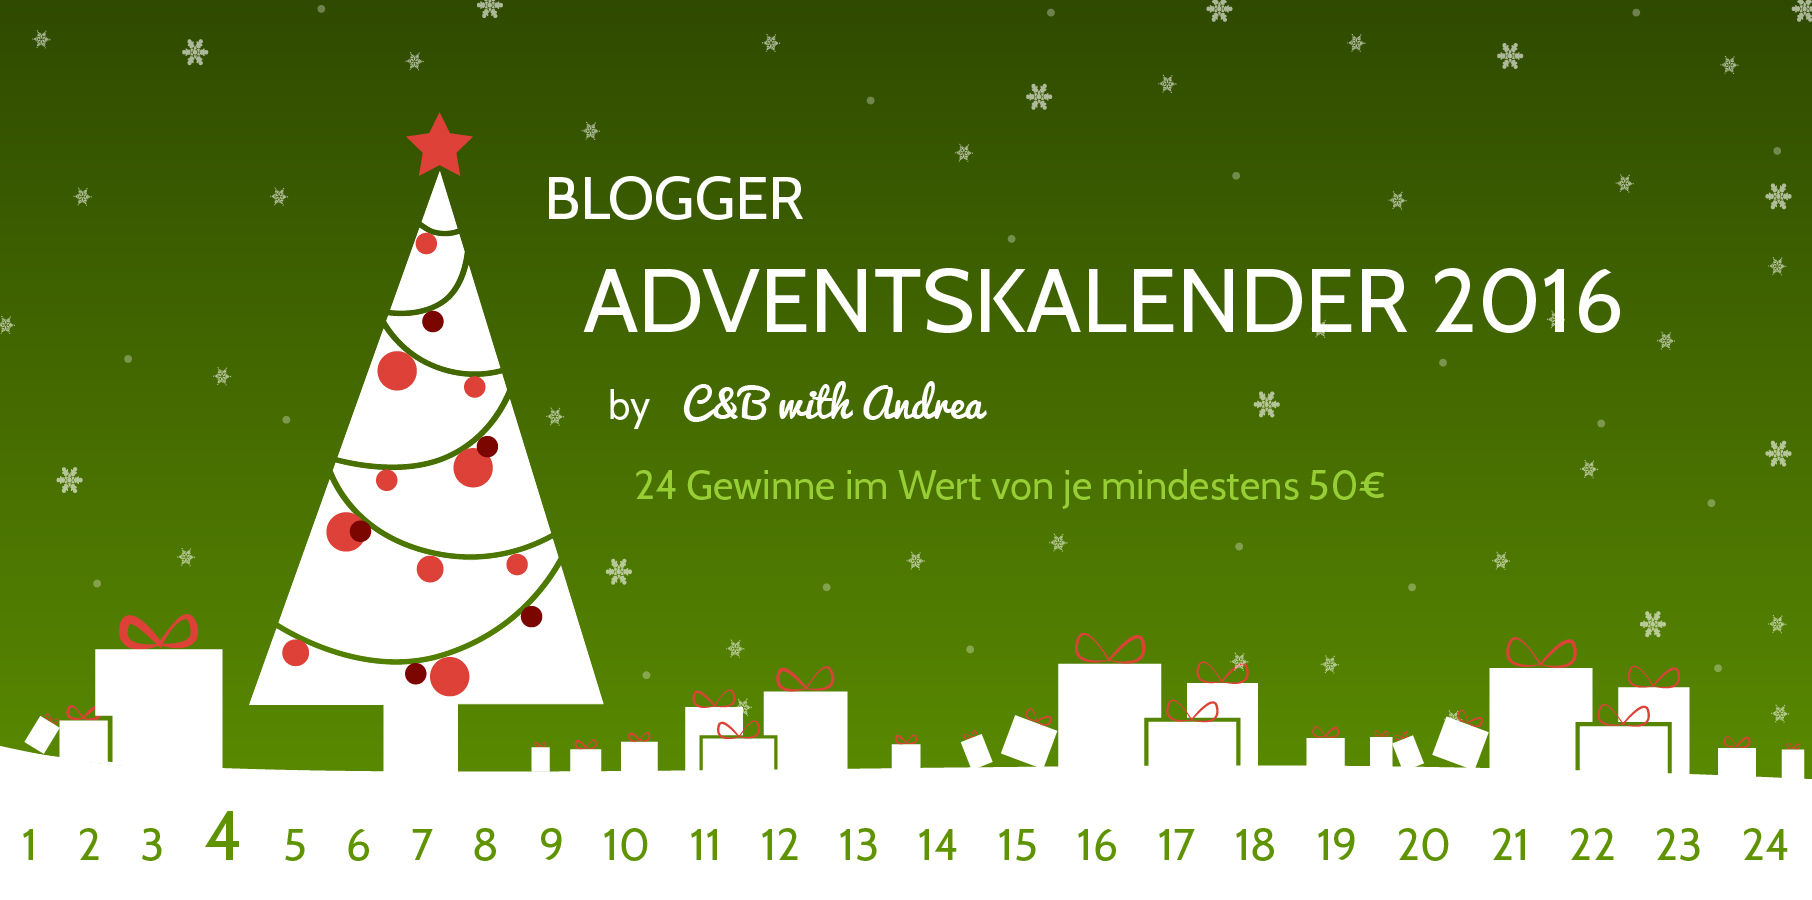 C&B with Andrea - Blogger-Adventskalender - Gewinnspiel - www.candbwithandrea.com4[2524]